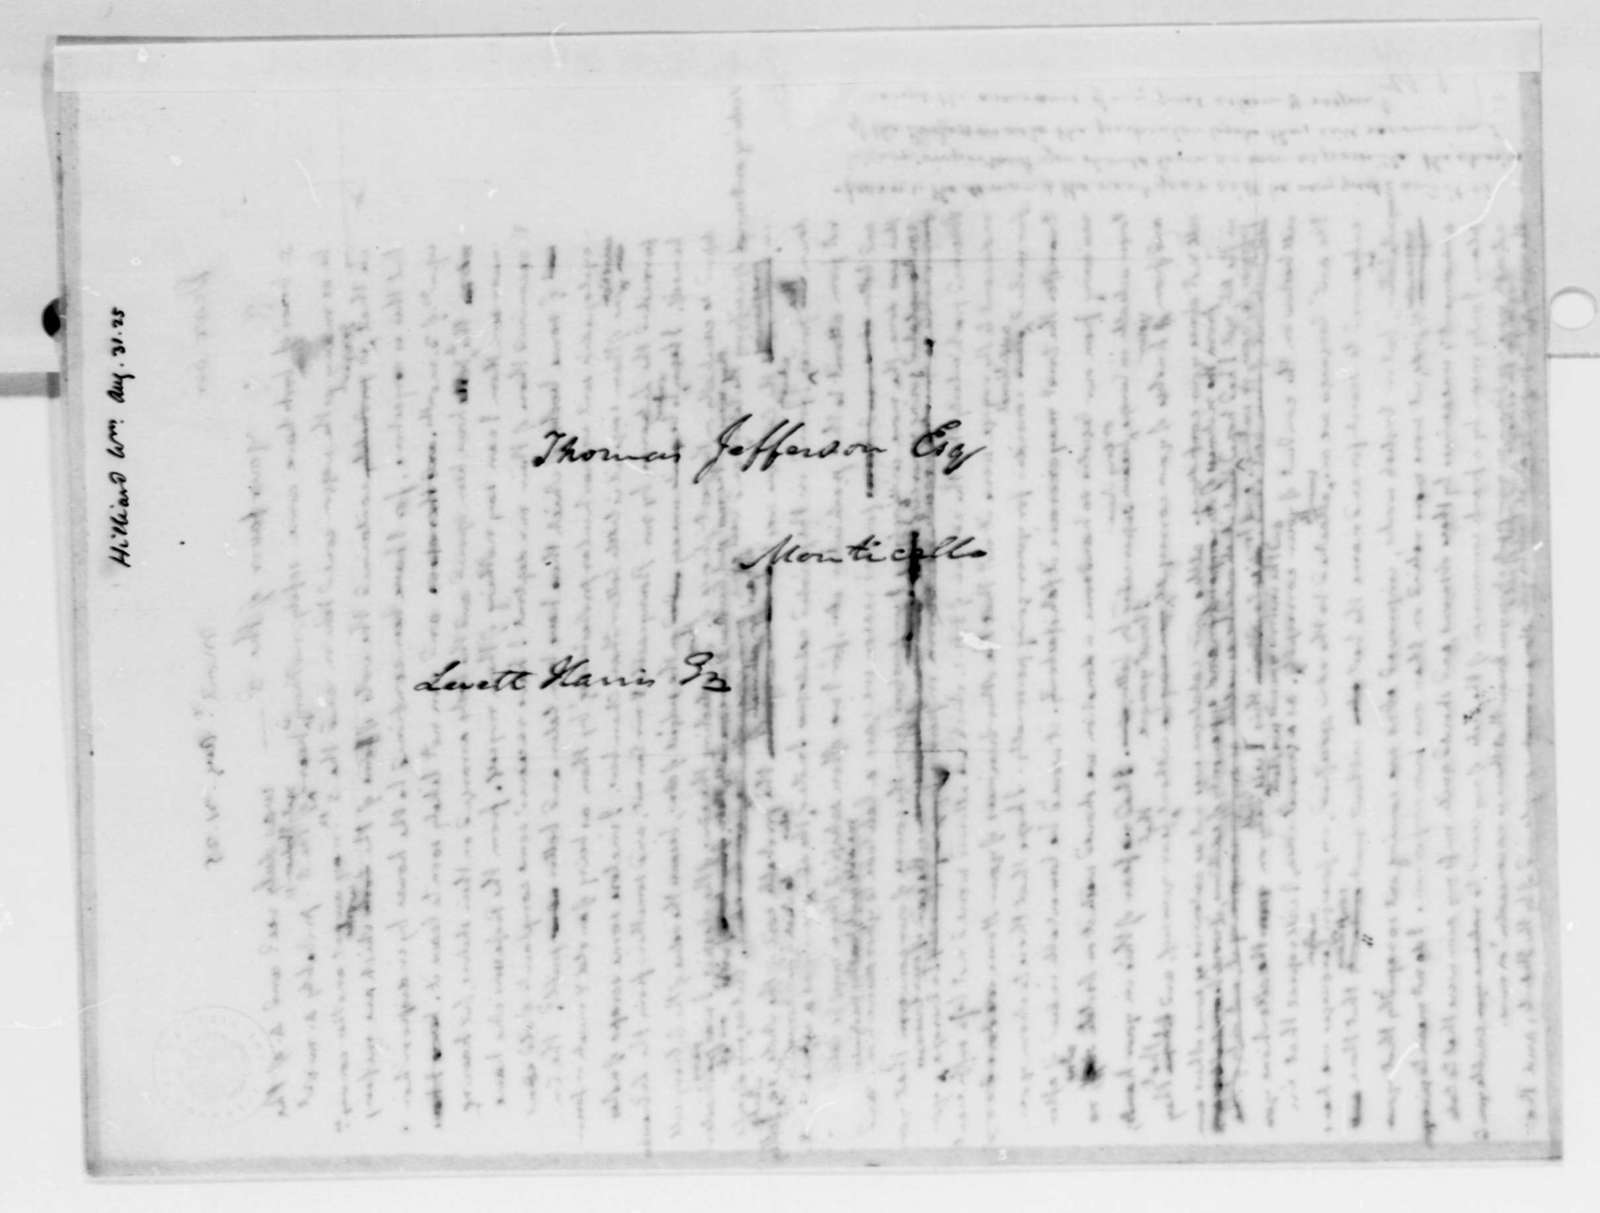 Thomas Jefferson to William Hilliard, August 31, 1825